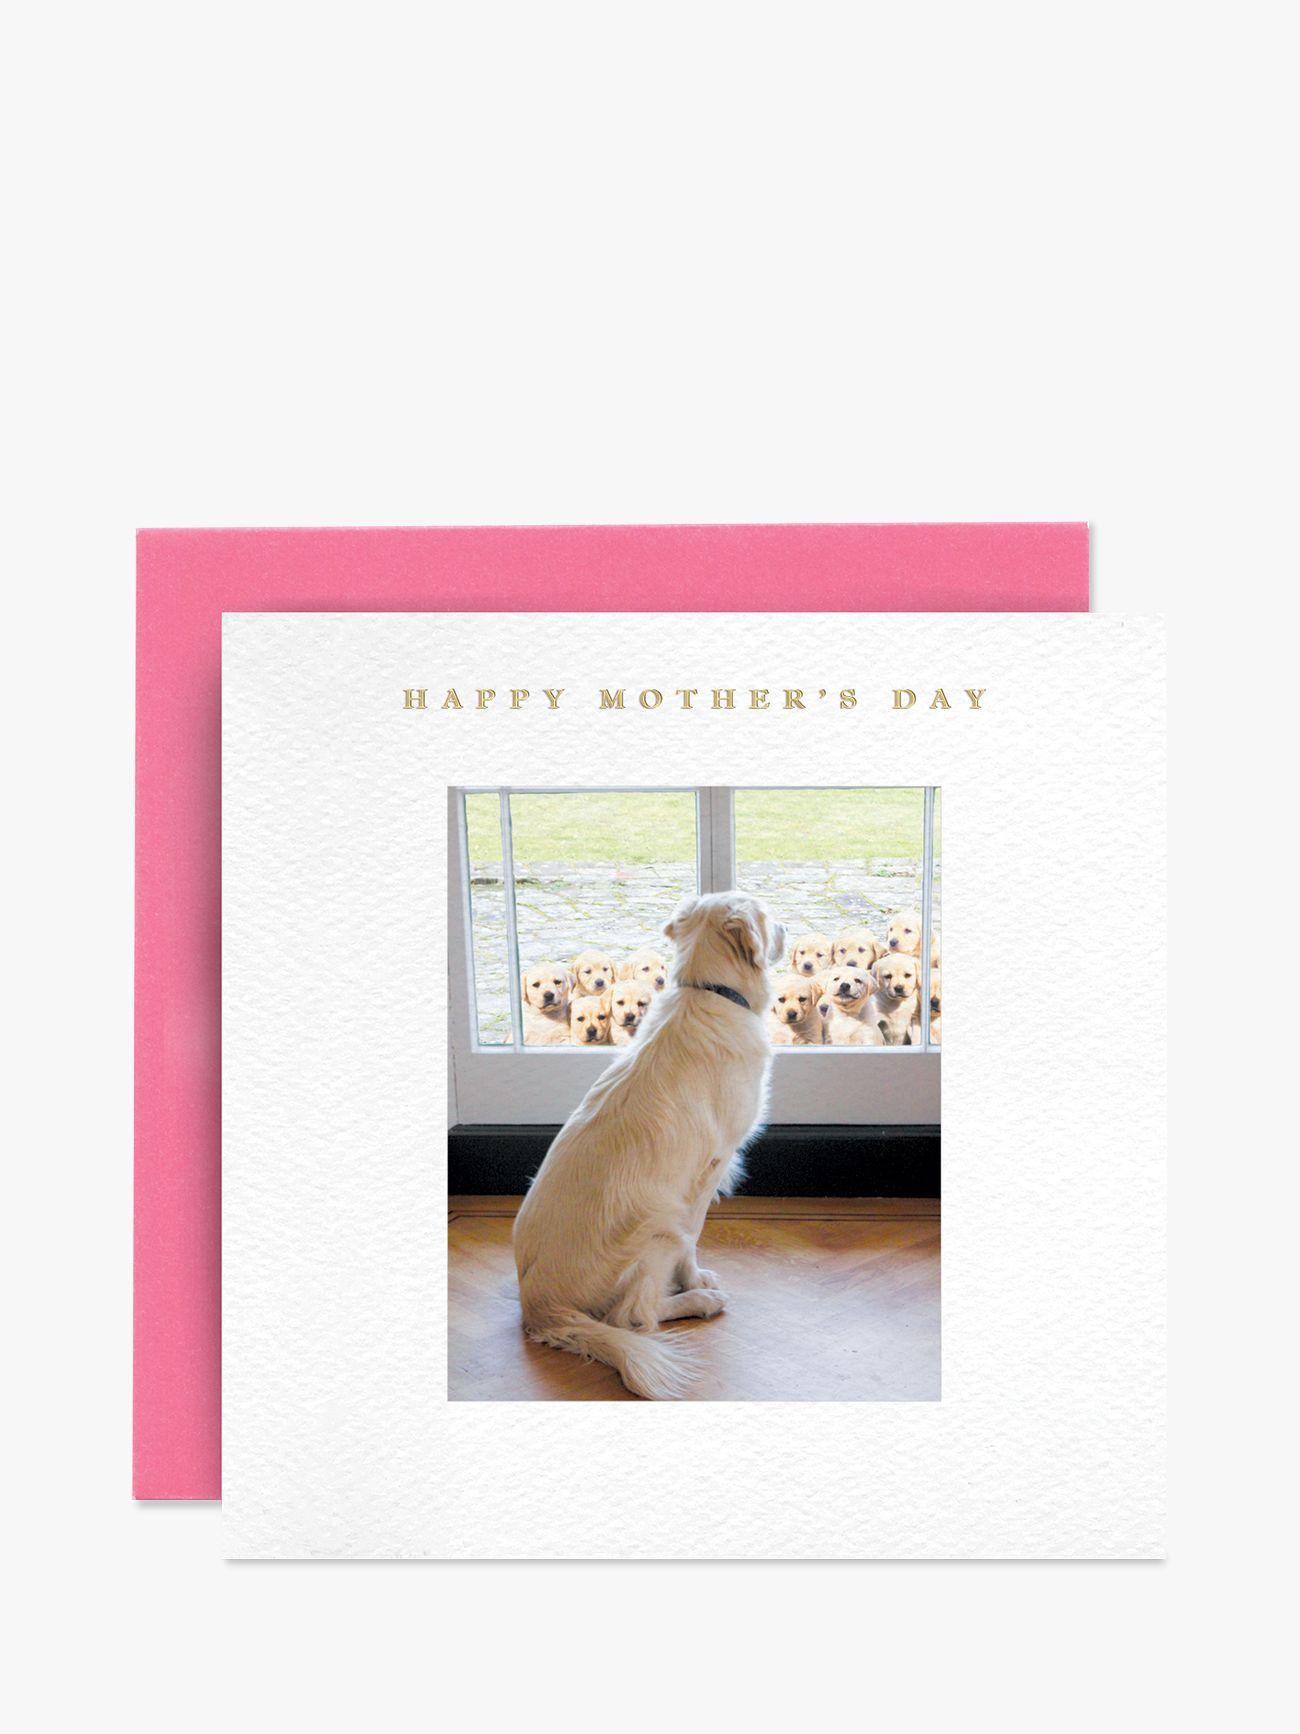 Susan O'Hanlon Susan O'Hanlon Retriever & Pups Mother's Day Card